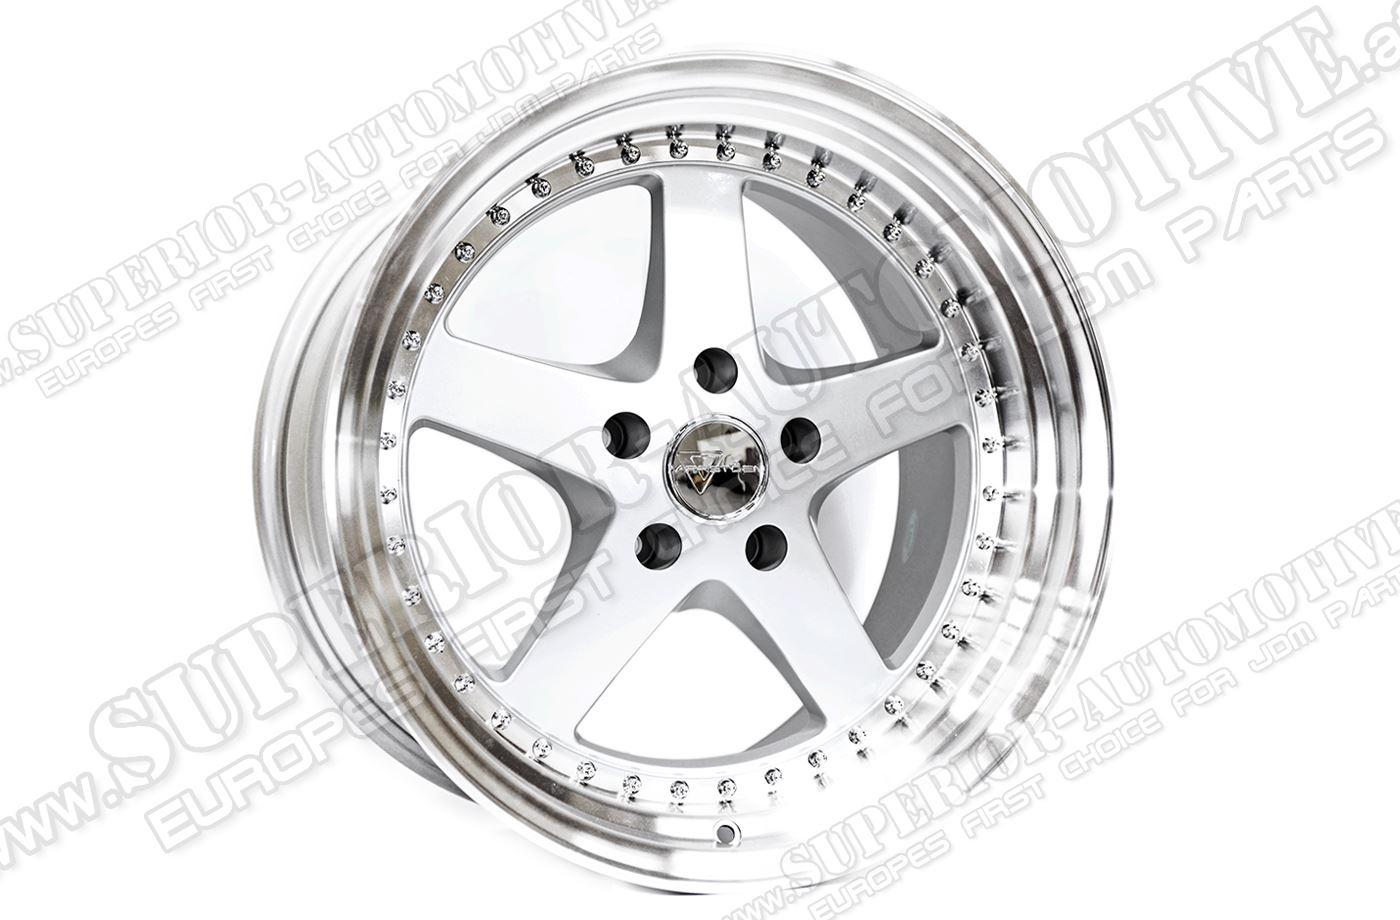 superior automotive web shop varrstoen es8 19 width 9 5 et 12 2 5 Boxer Engine varrstoen es8 19